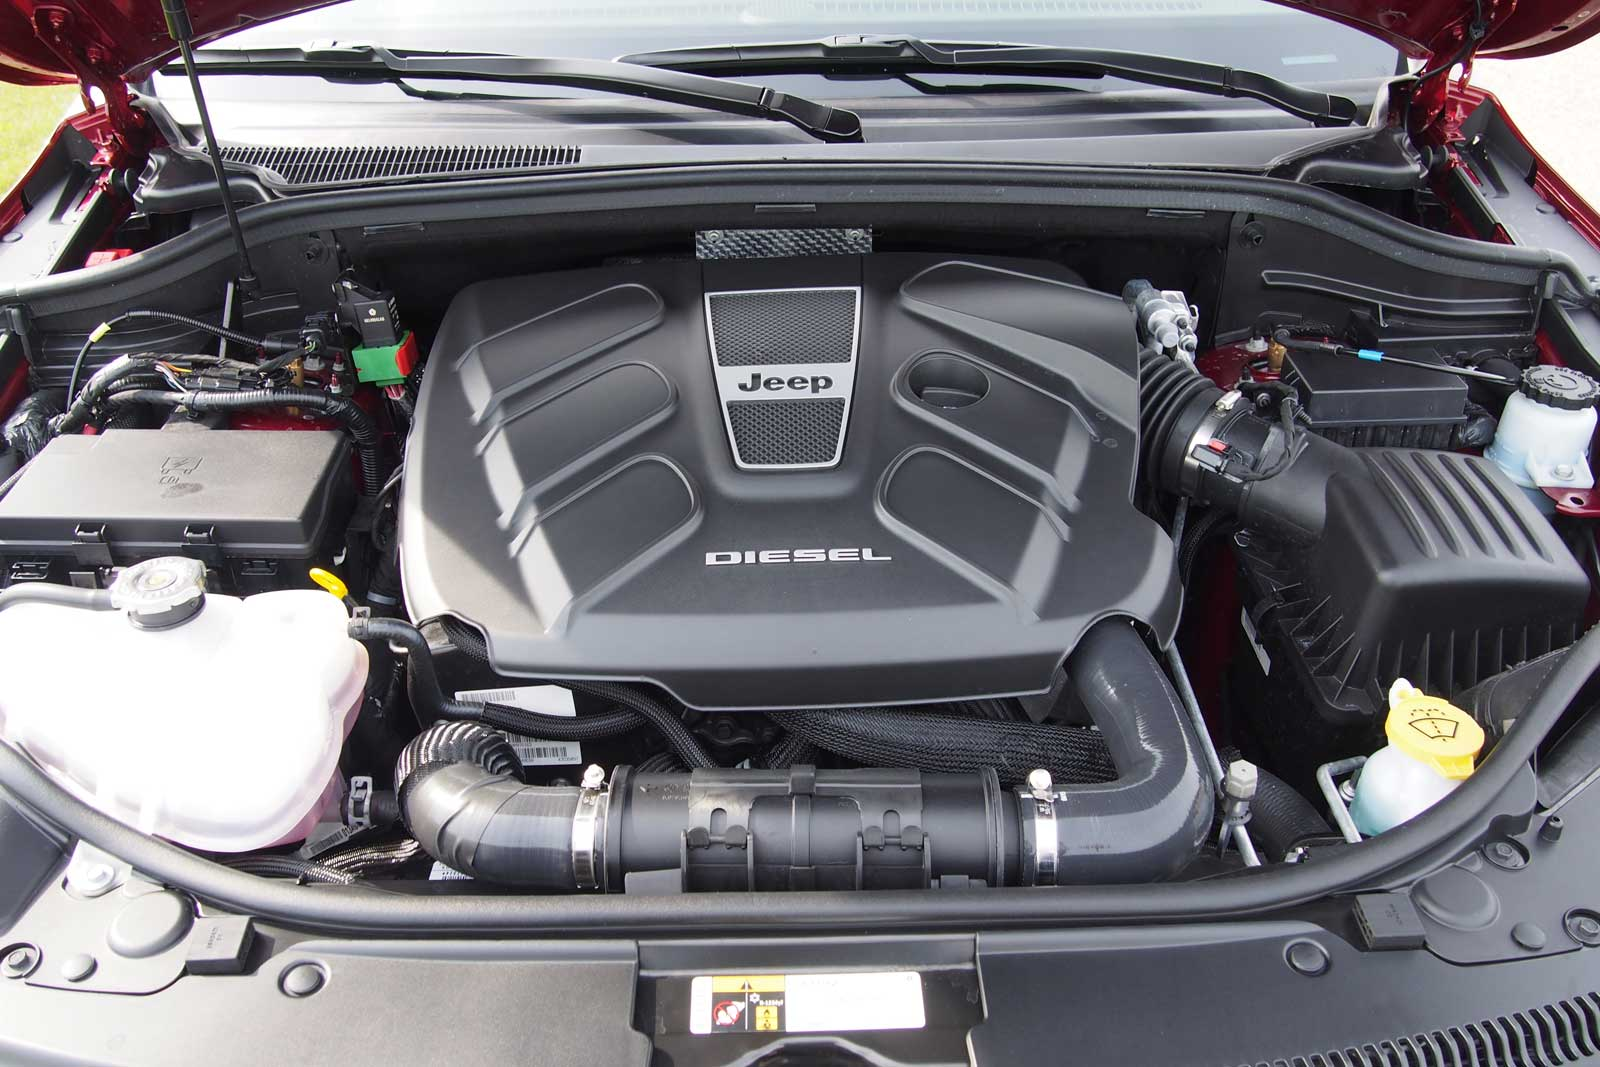 2016-Jeep-Grand-Cherokee-Engine-01.jpg